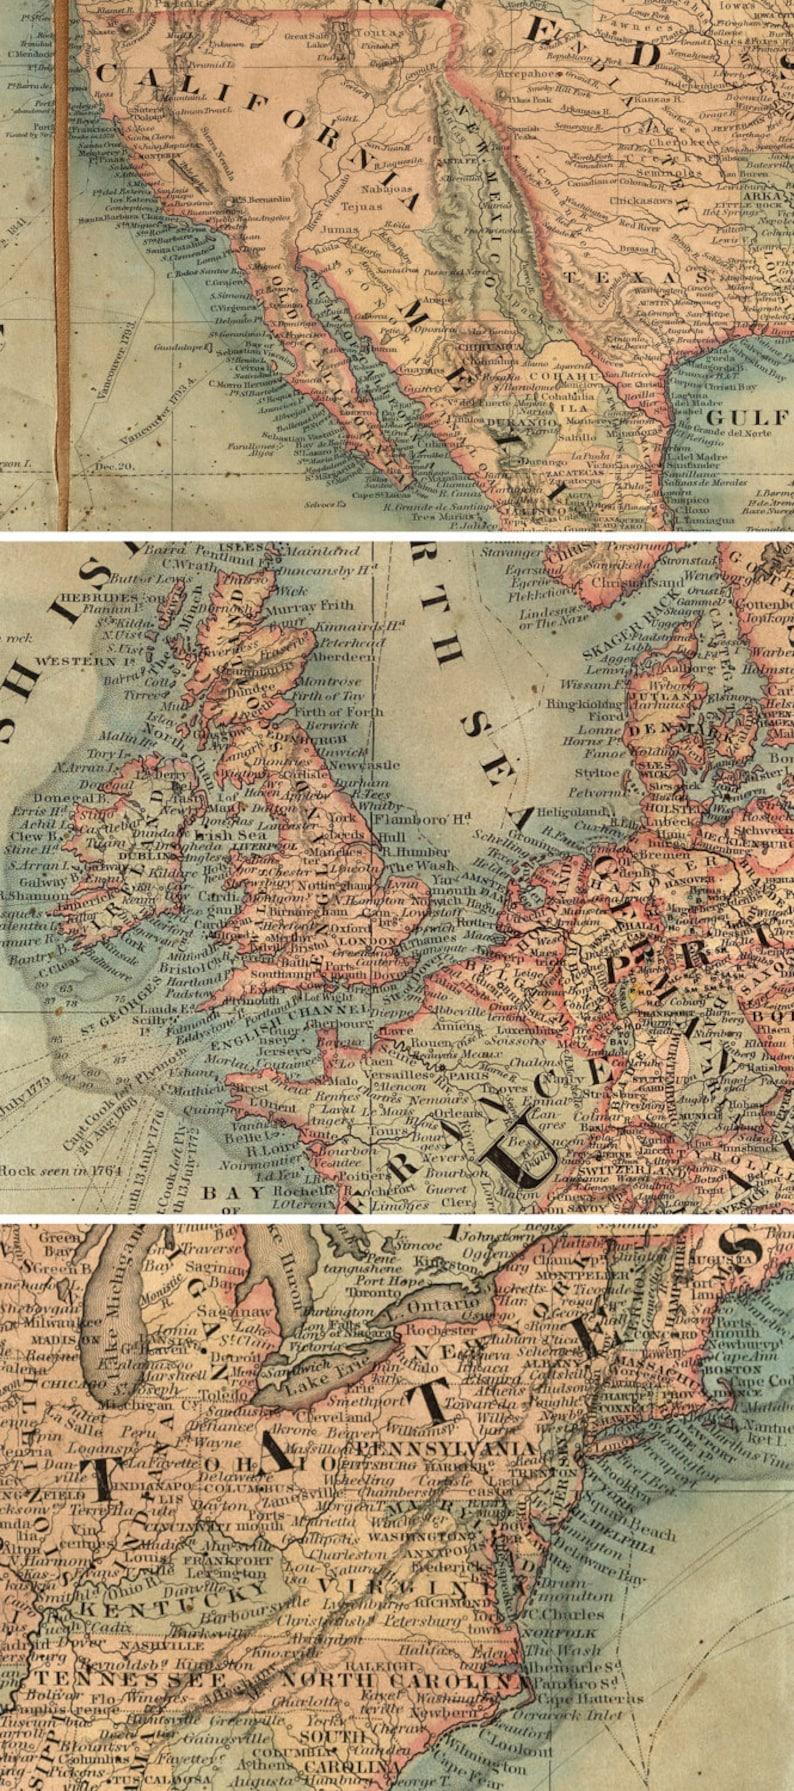 Amazing world map 1800, 90\'\' x 60\'\' , 230 x 150cm, Canvas, Victorian style,  ZMAPS, World Cartography, Antique furniture, Antique hotel